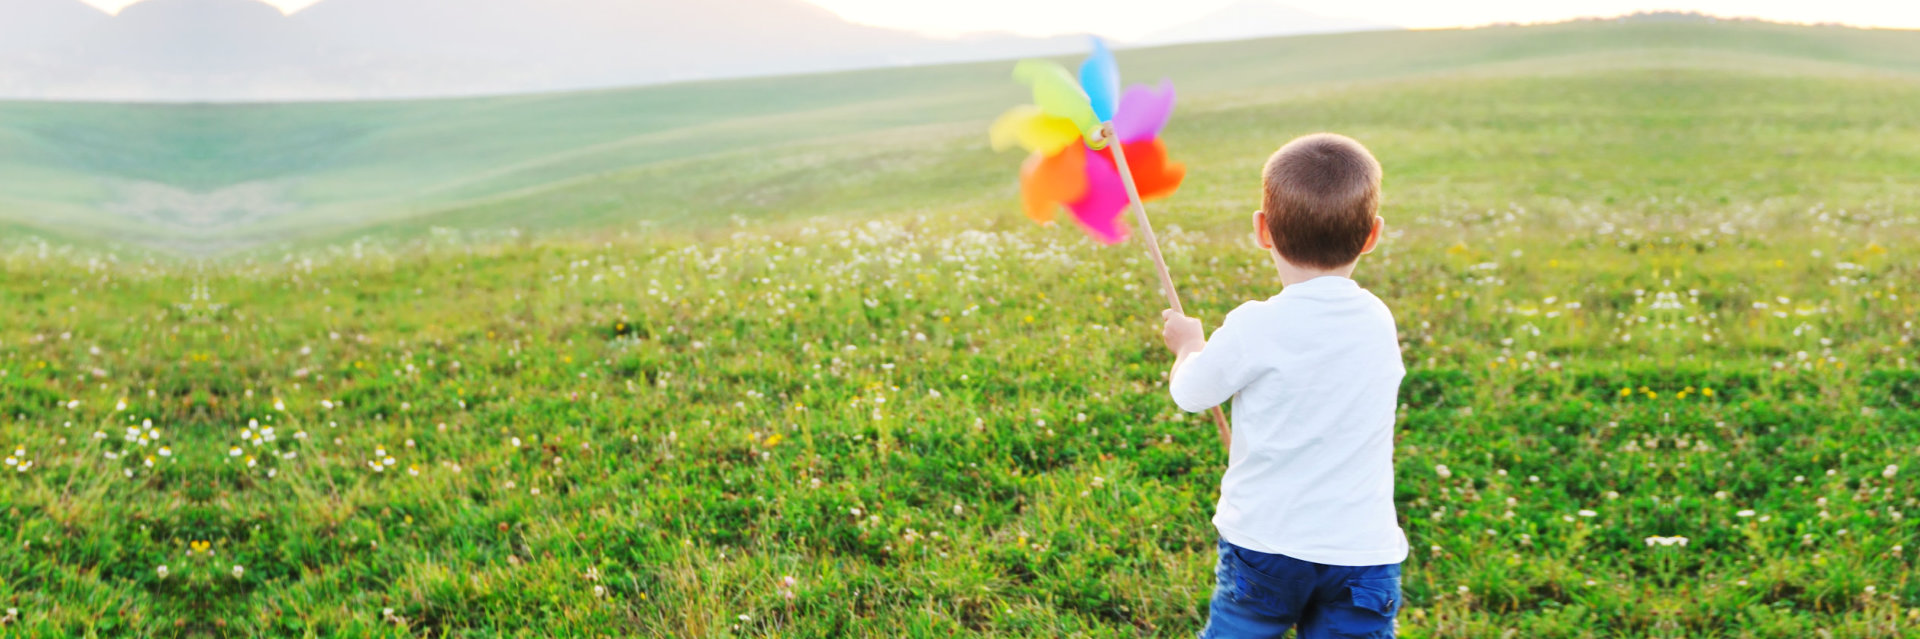 Happy child have fun outdoor